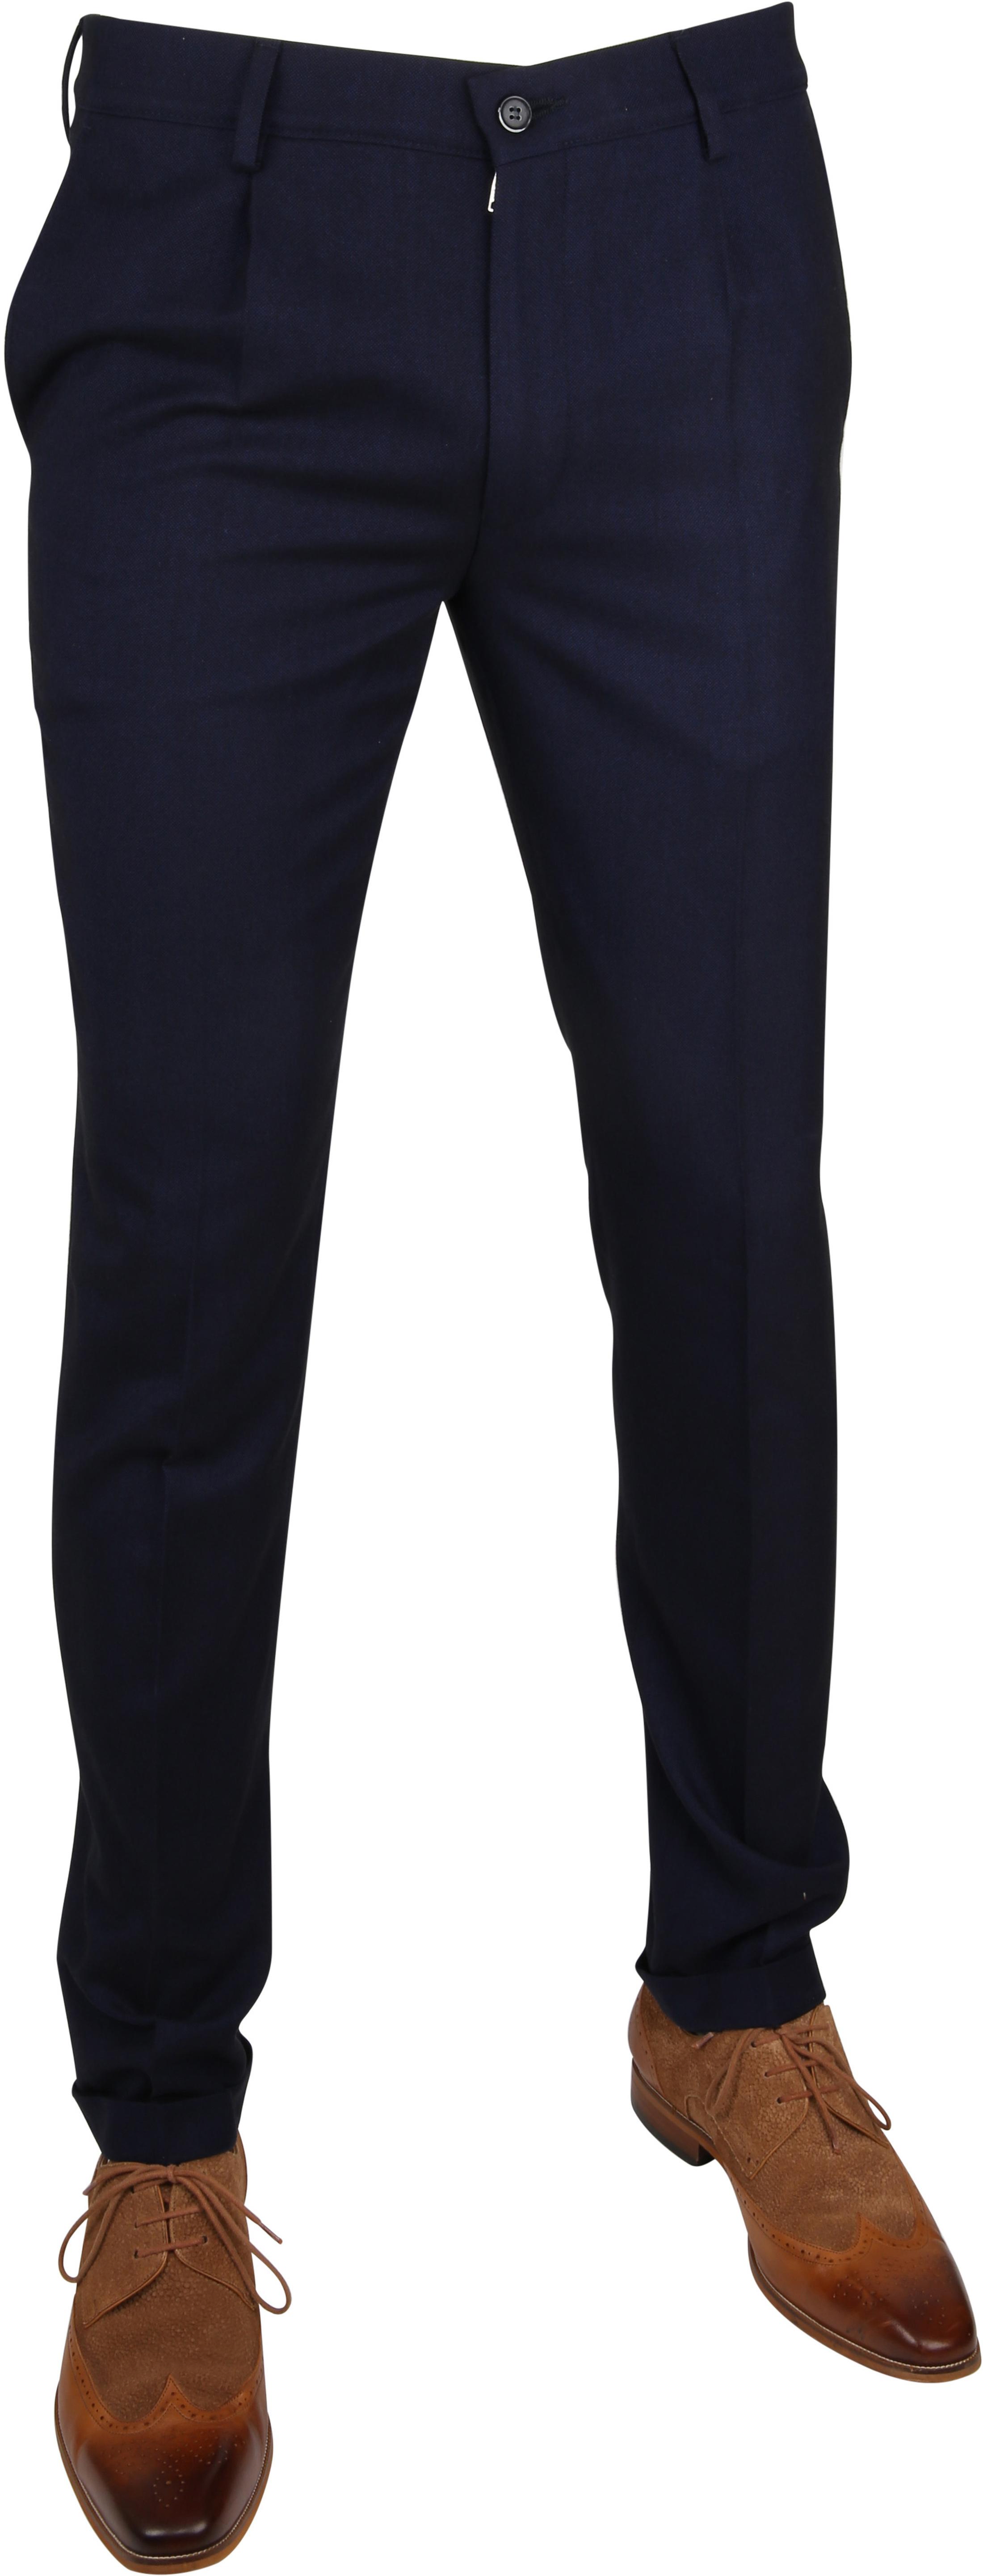 Suitable Premium Pantalon Rimini Navy foto 0